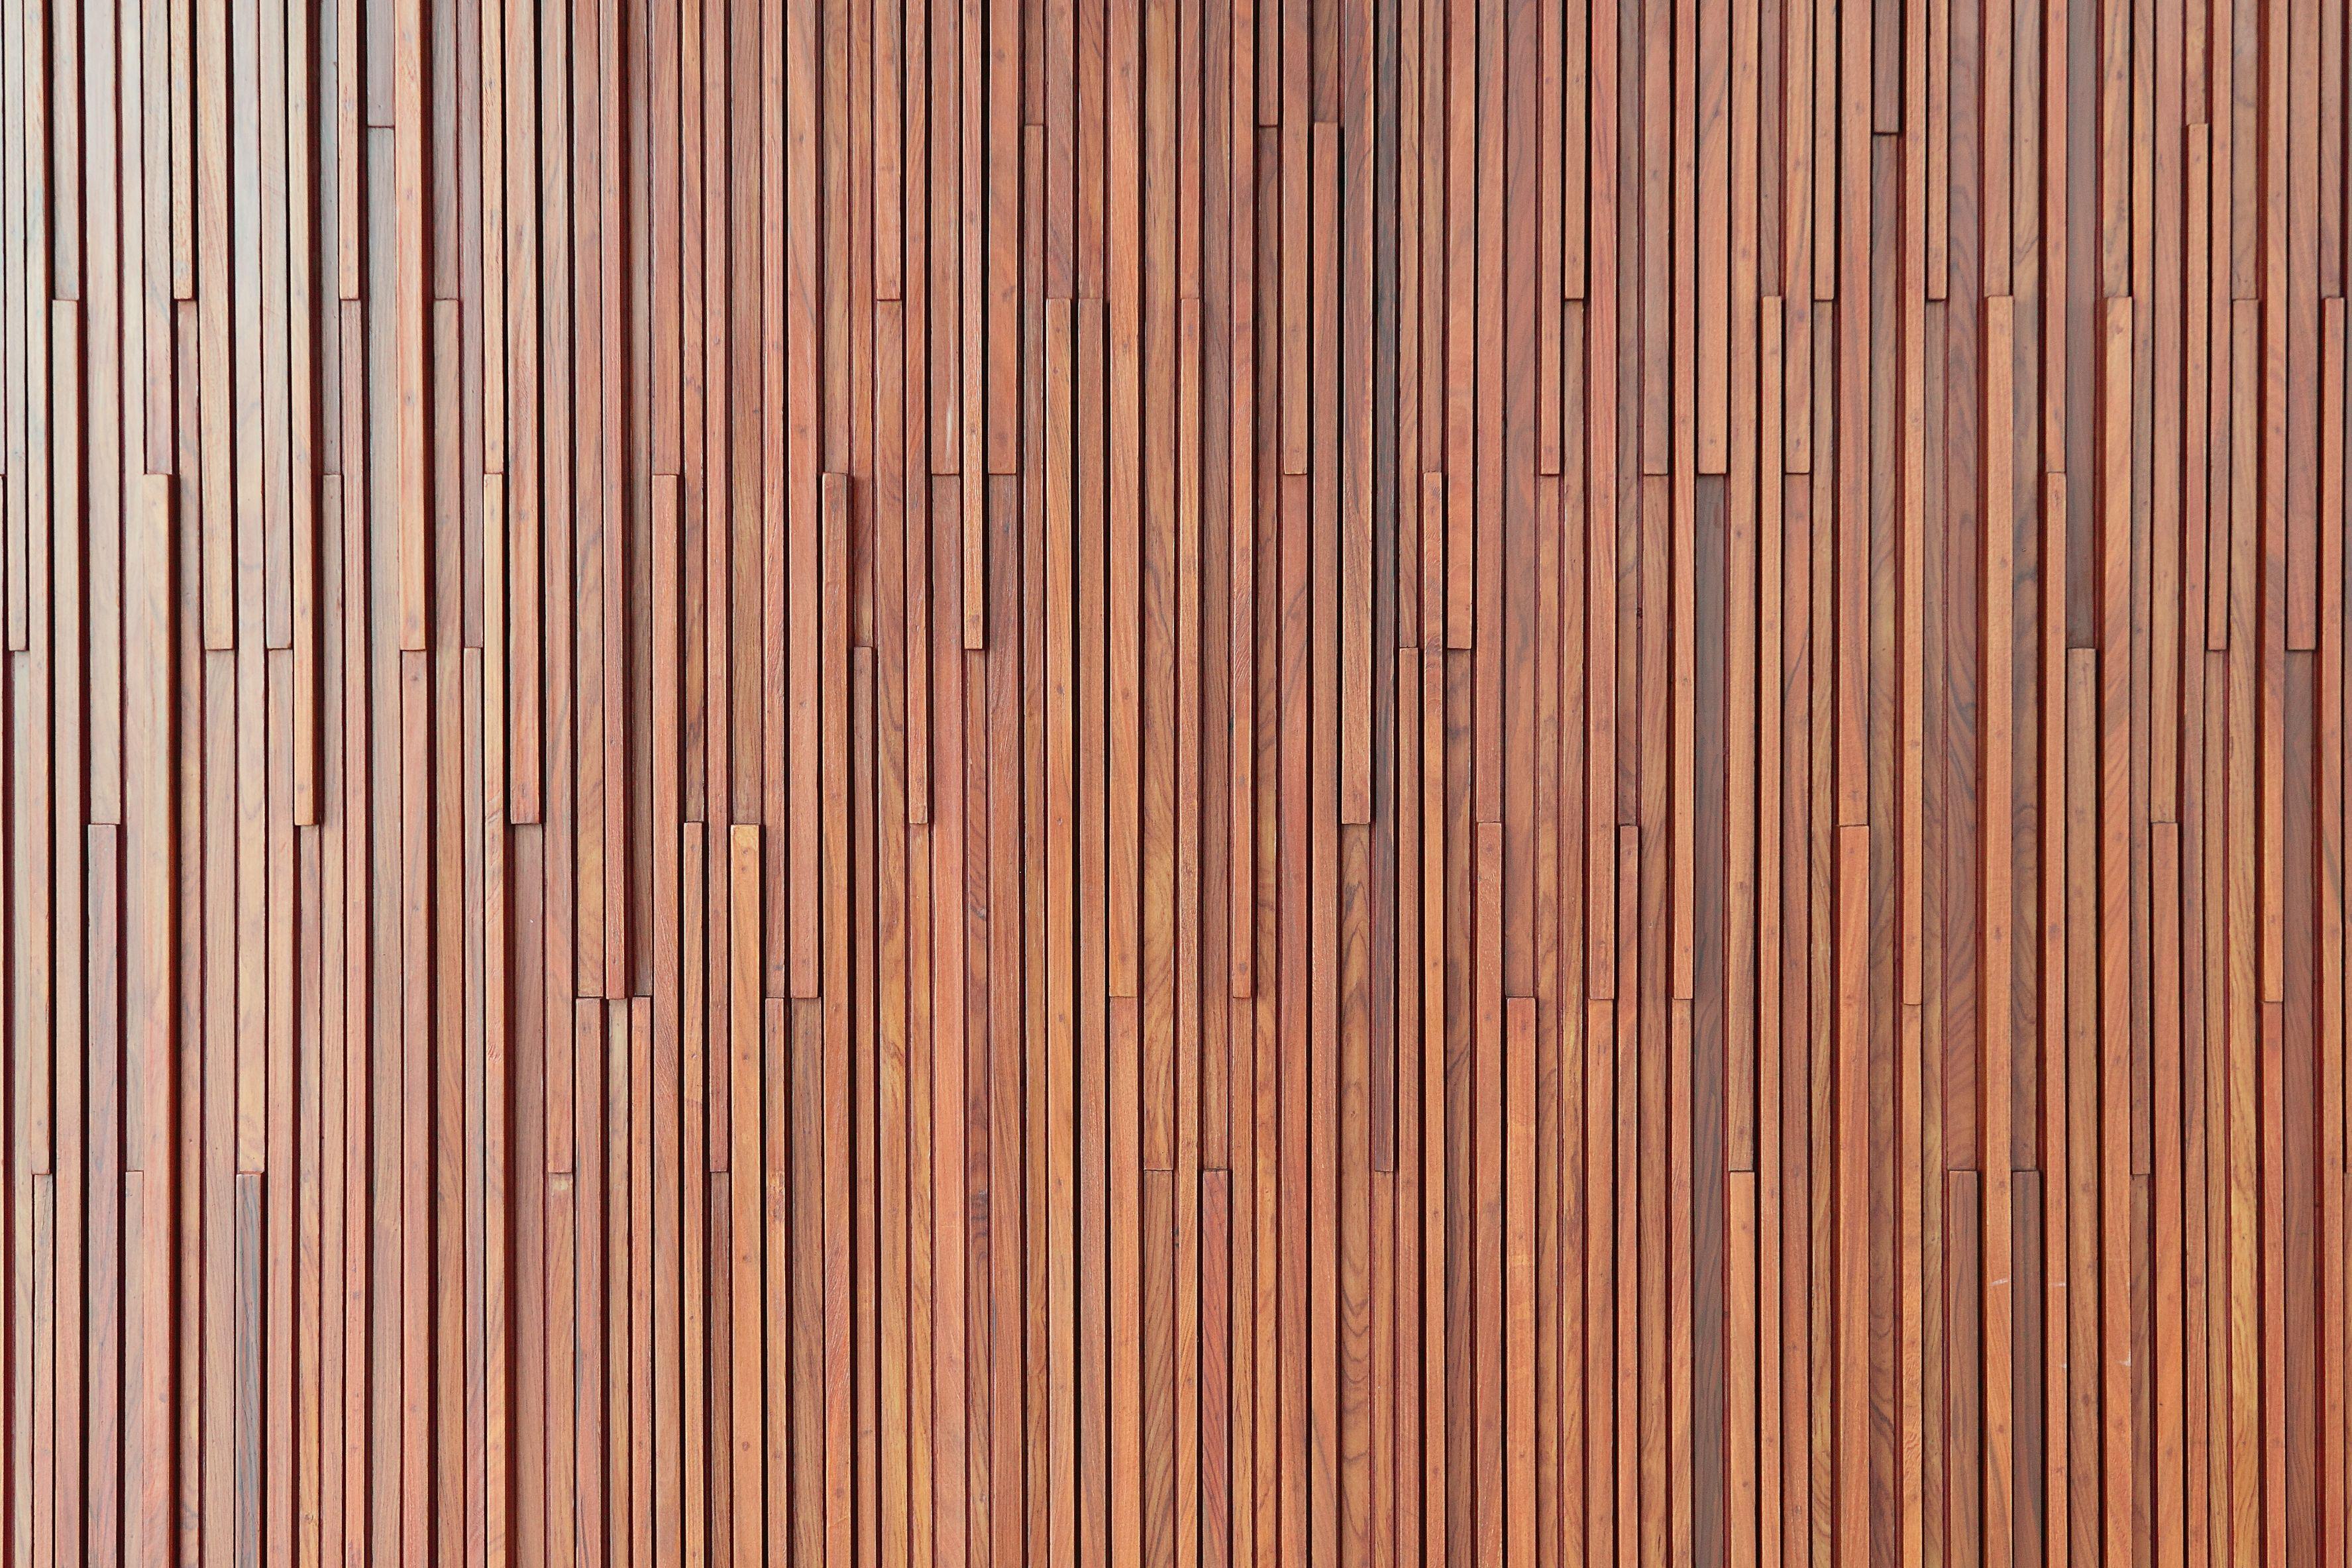 Dark Timber Board Texture Google Search